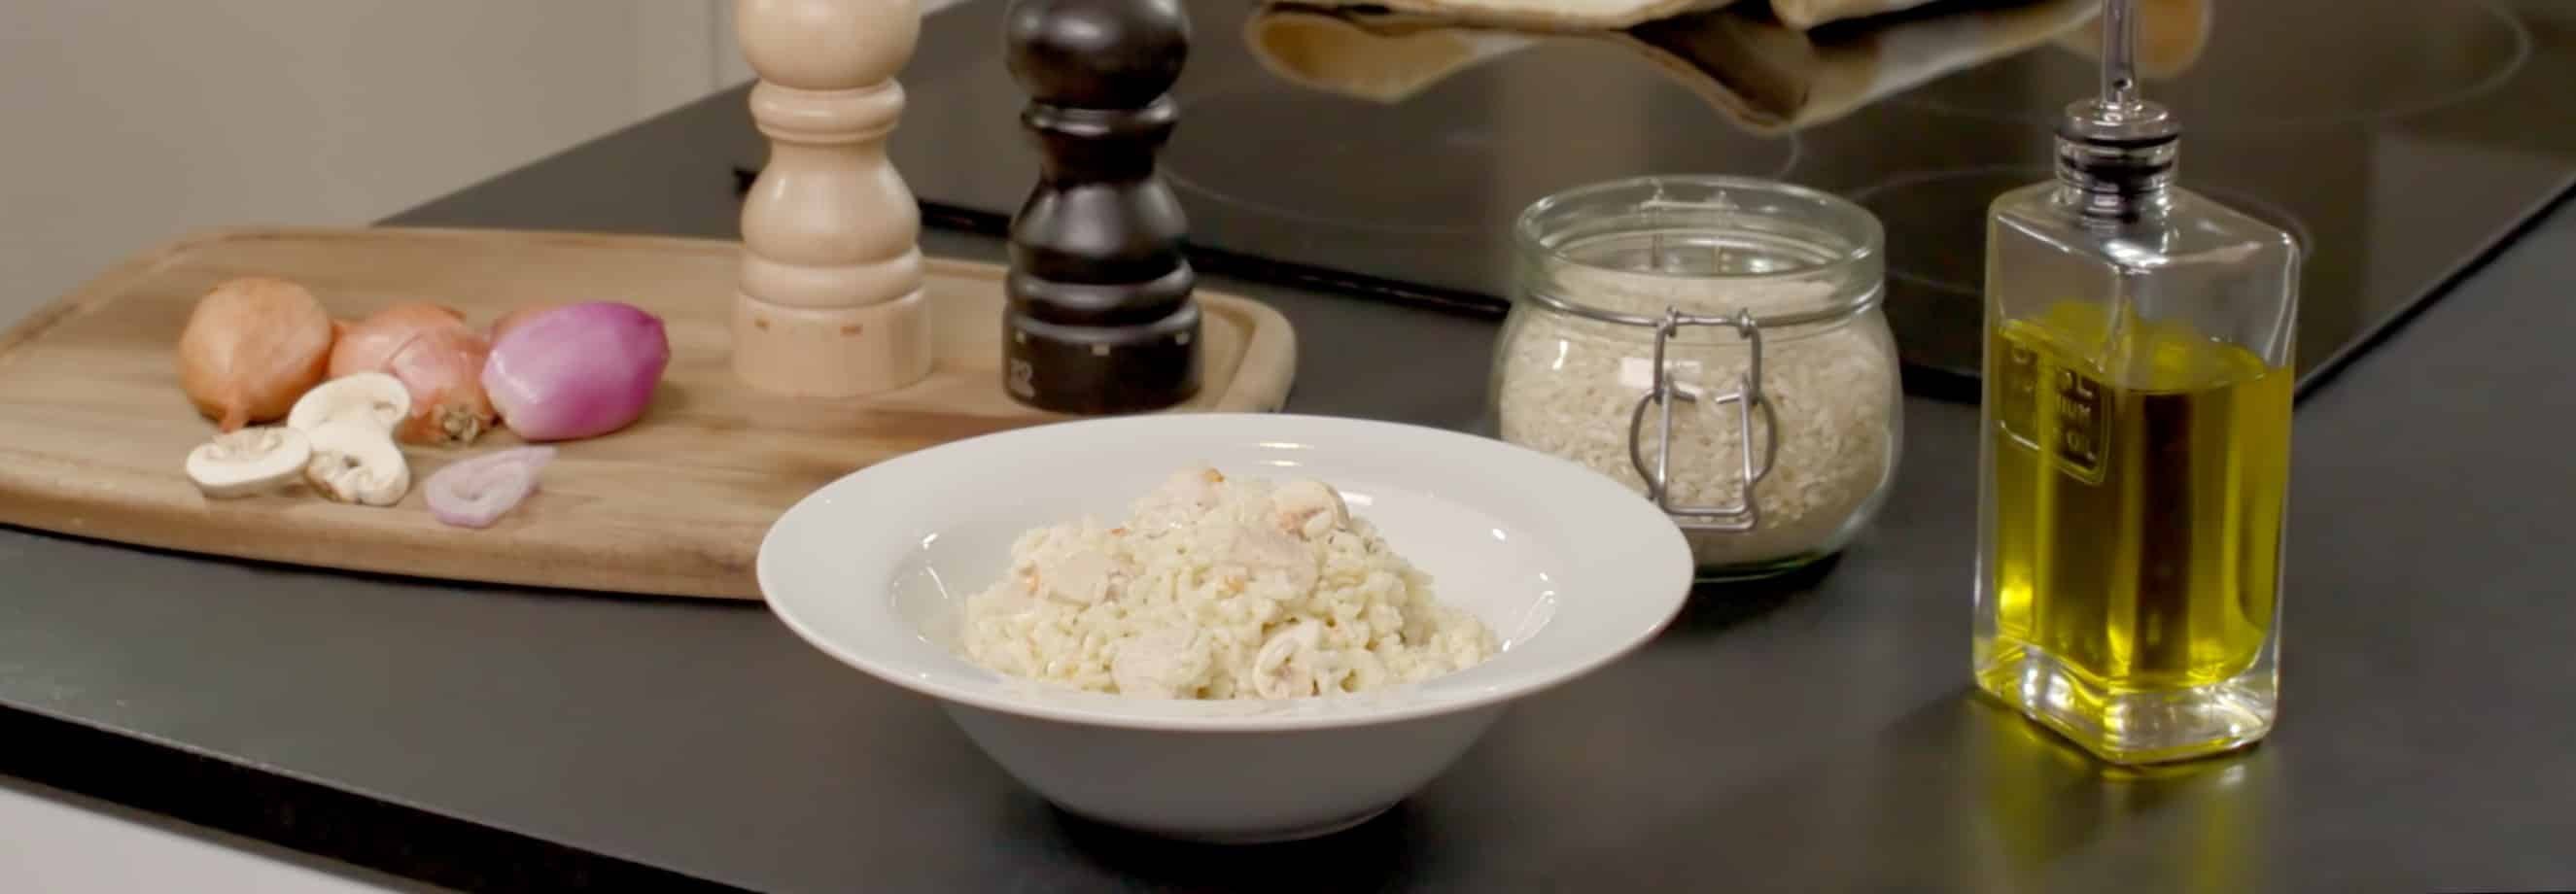 Risotto poulet et champignons - Galbani